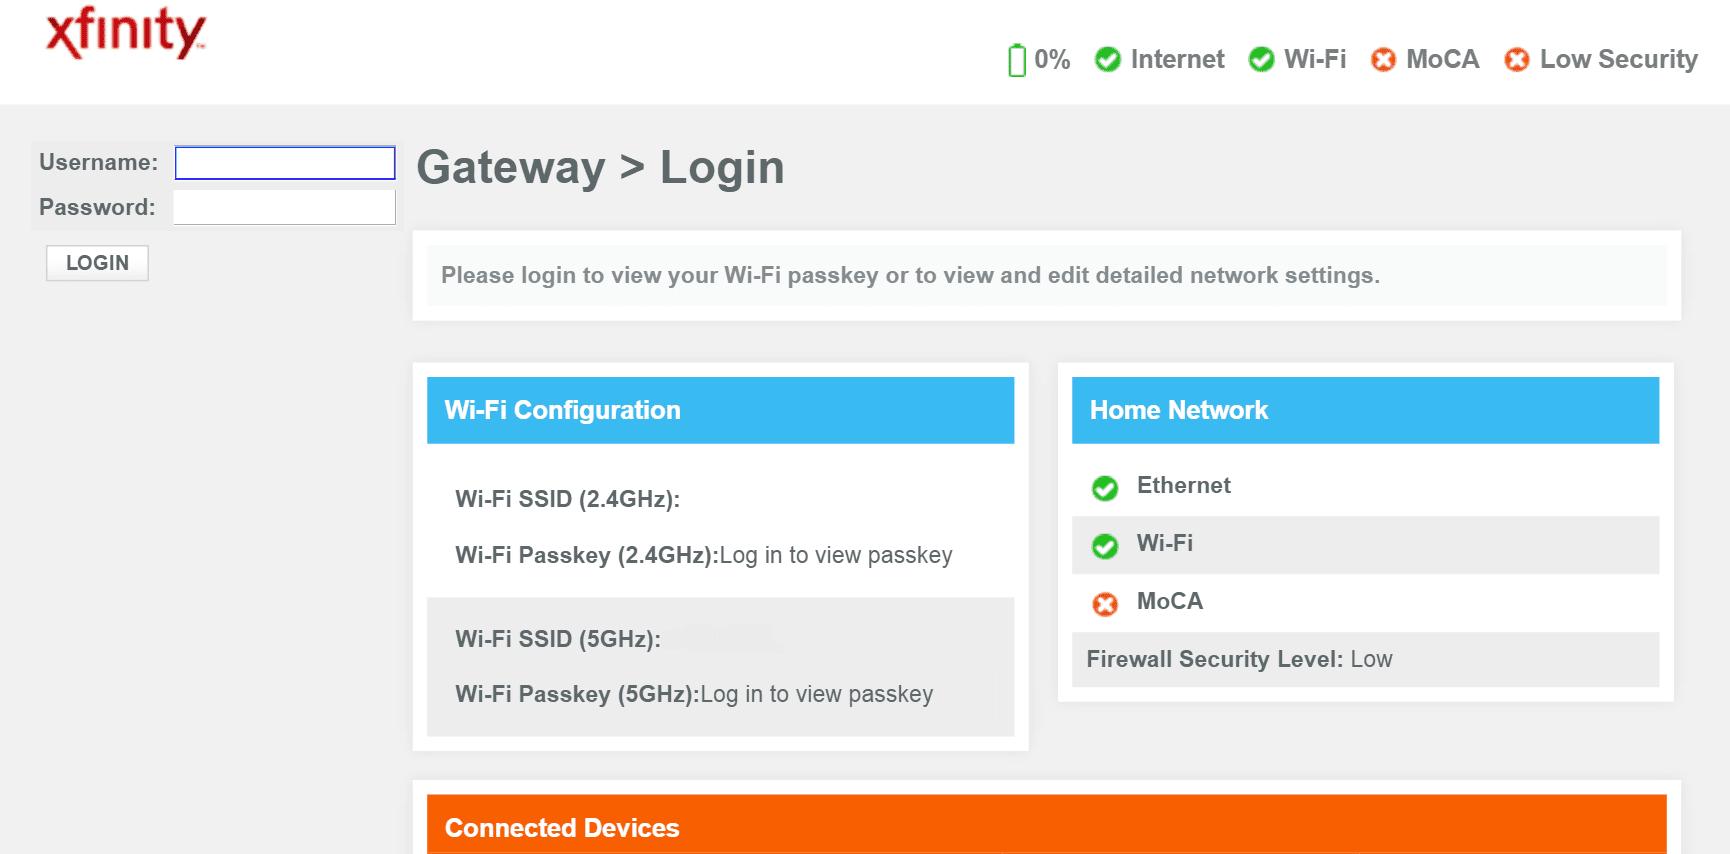 hight resolution of xfinity home gateway login page screenshot